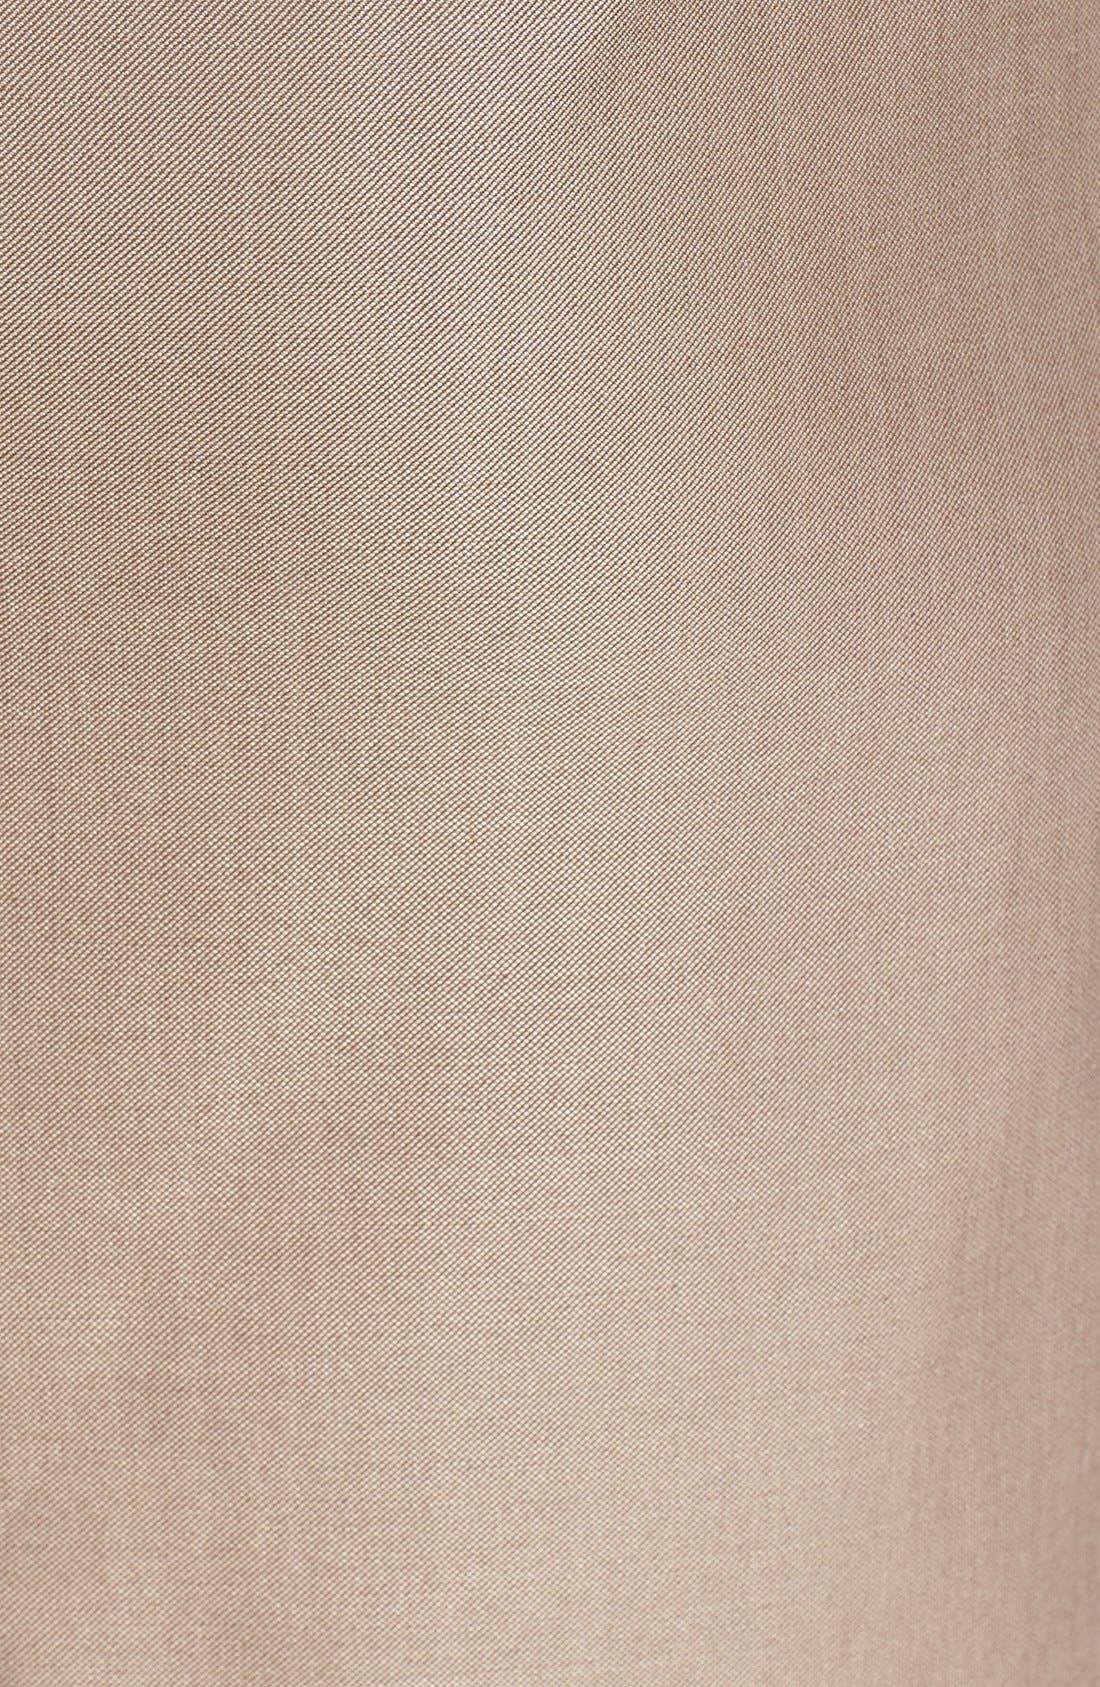 Alternate Image 3  - Max Mara Wool Blend Pencil Skirt